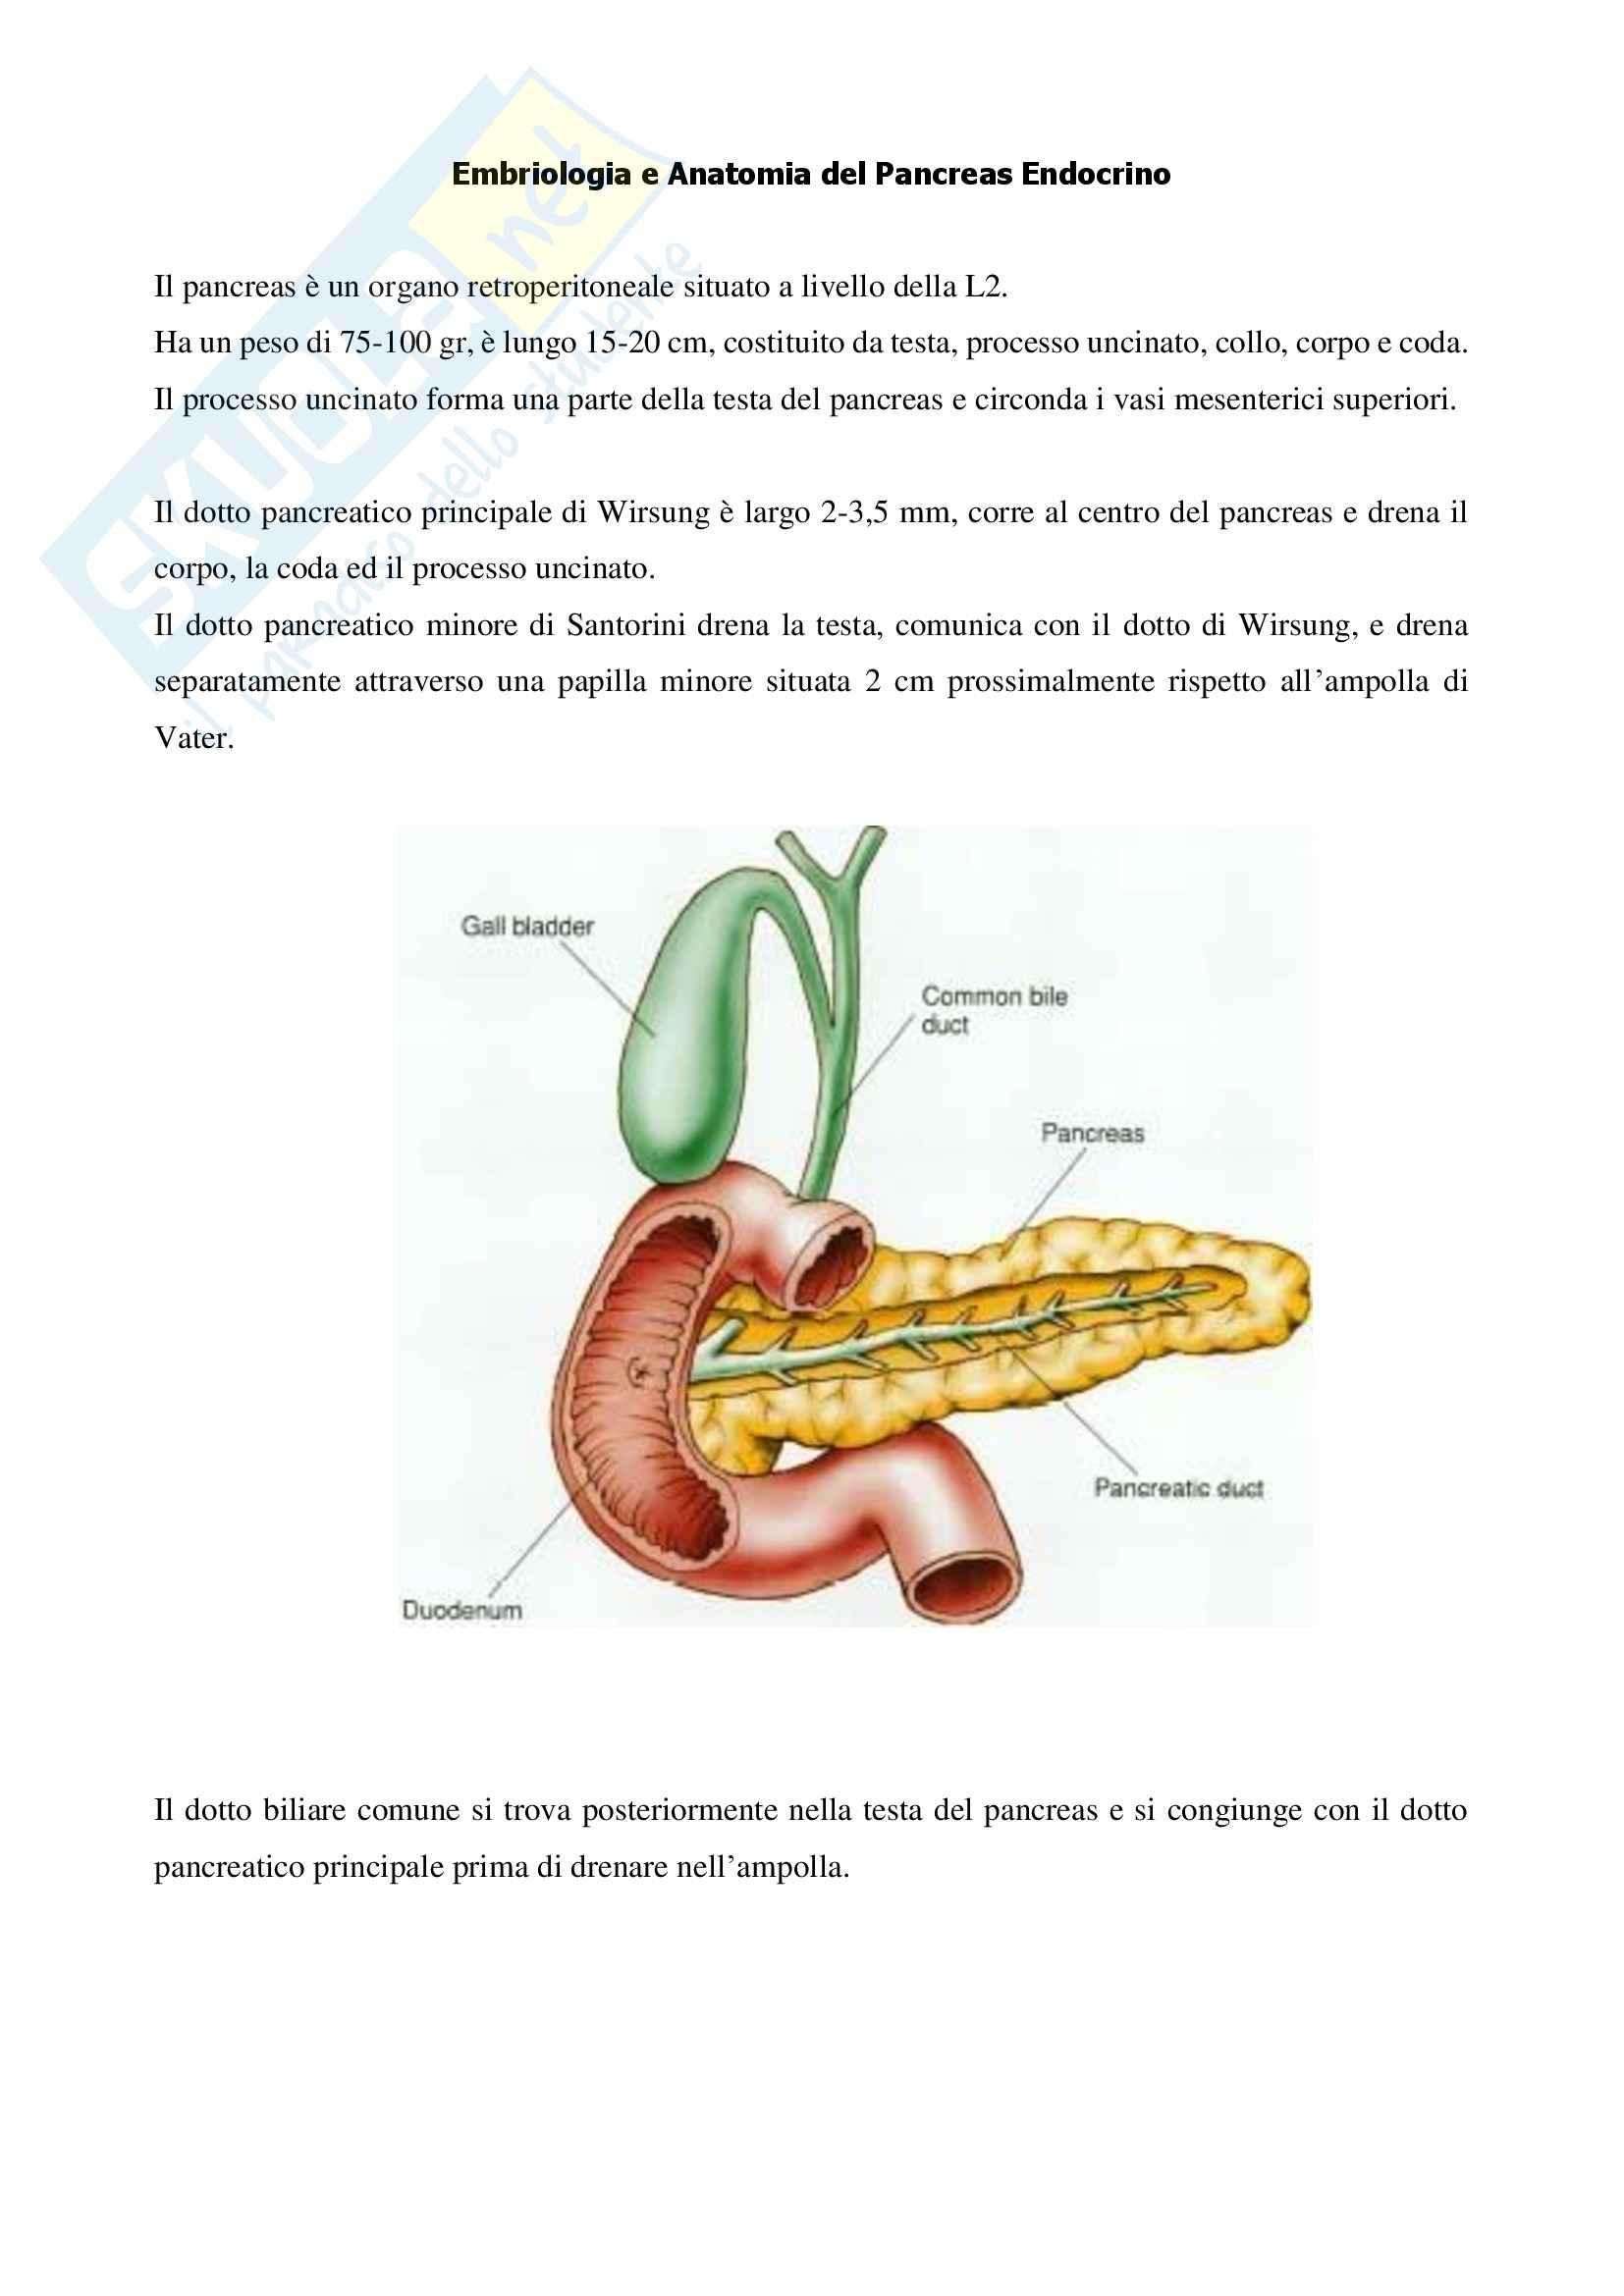 Endocrinologia - Embriologia e Anatomia del Pancreas Endocrino